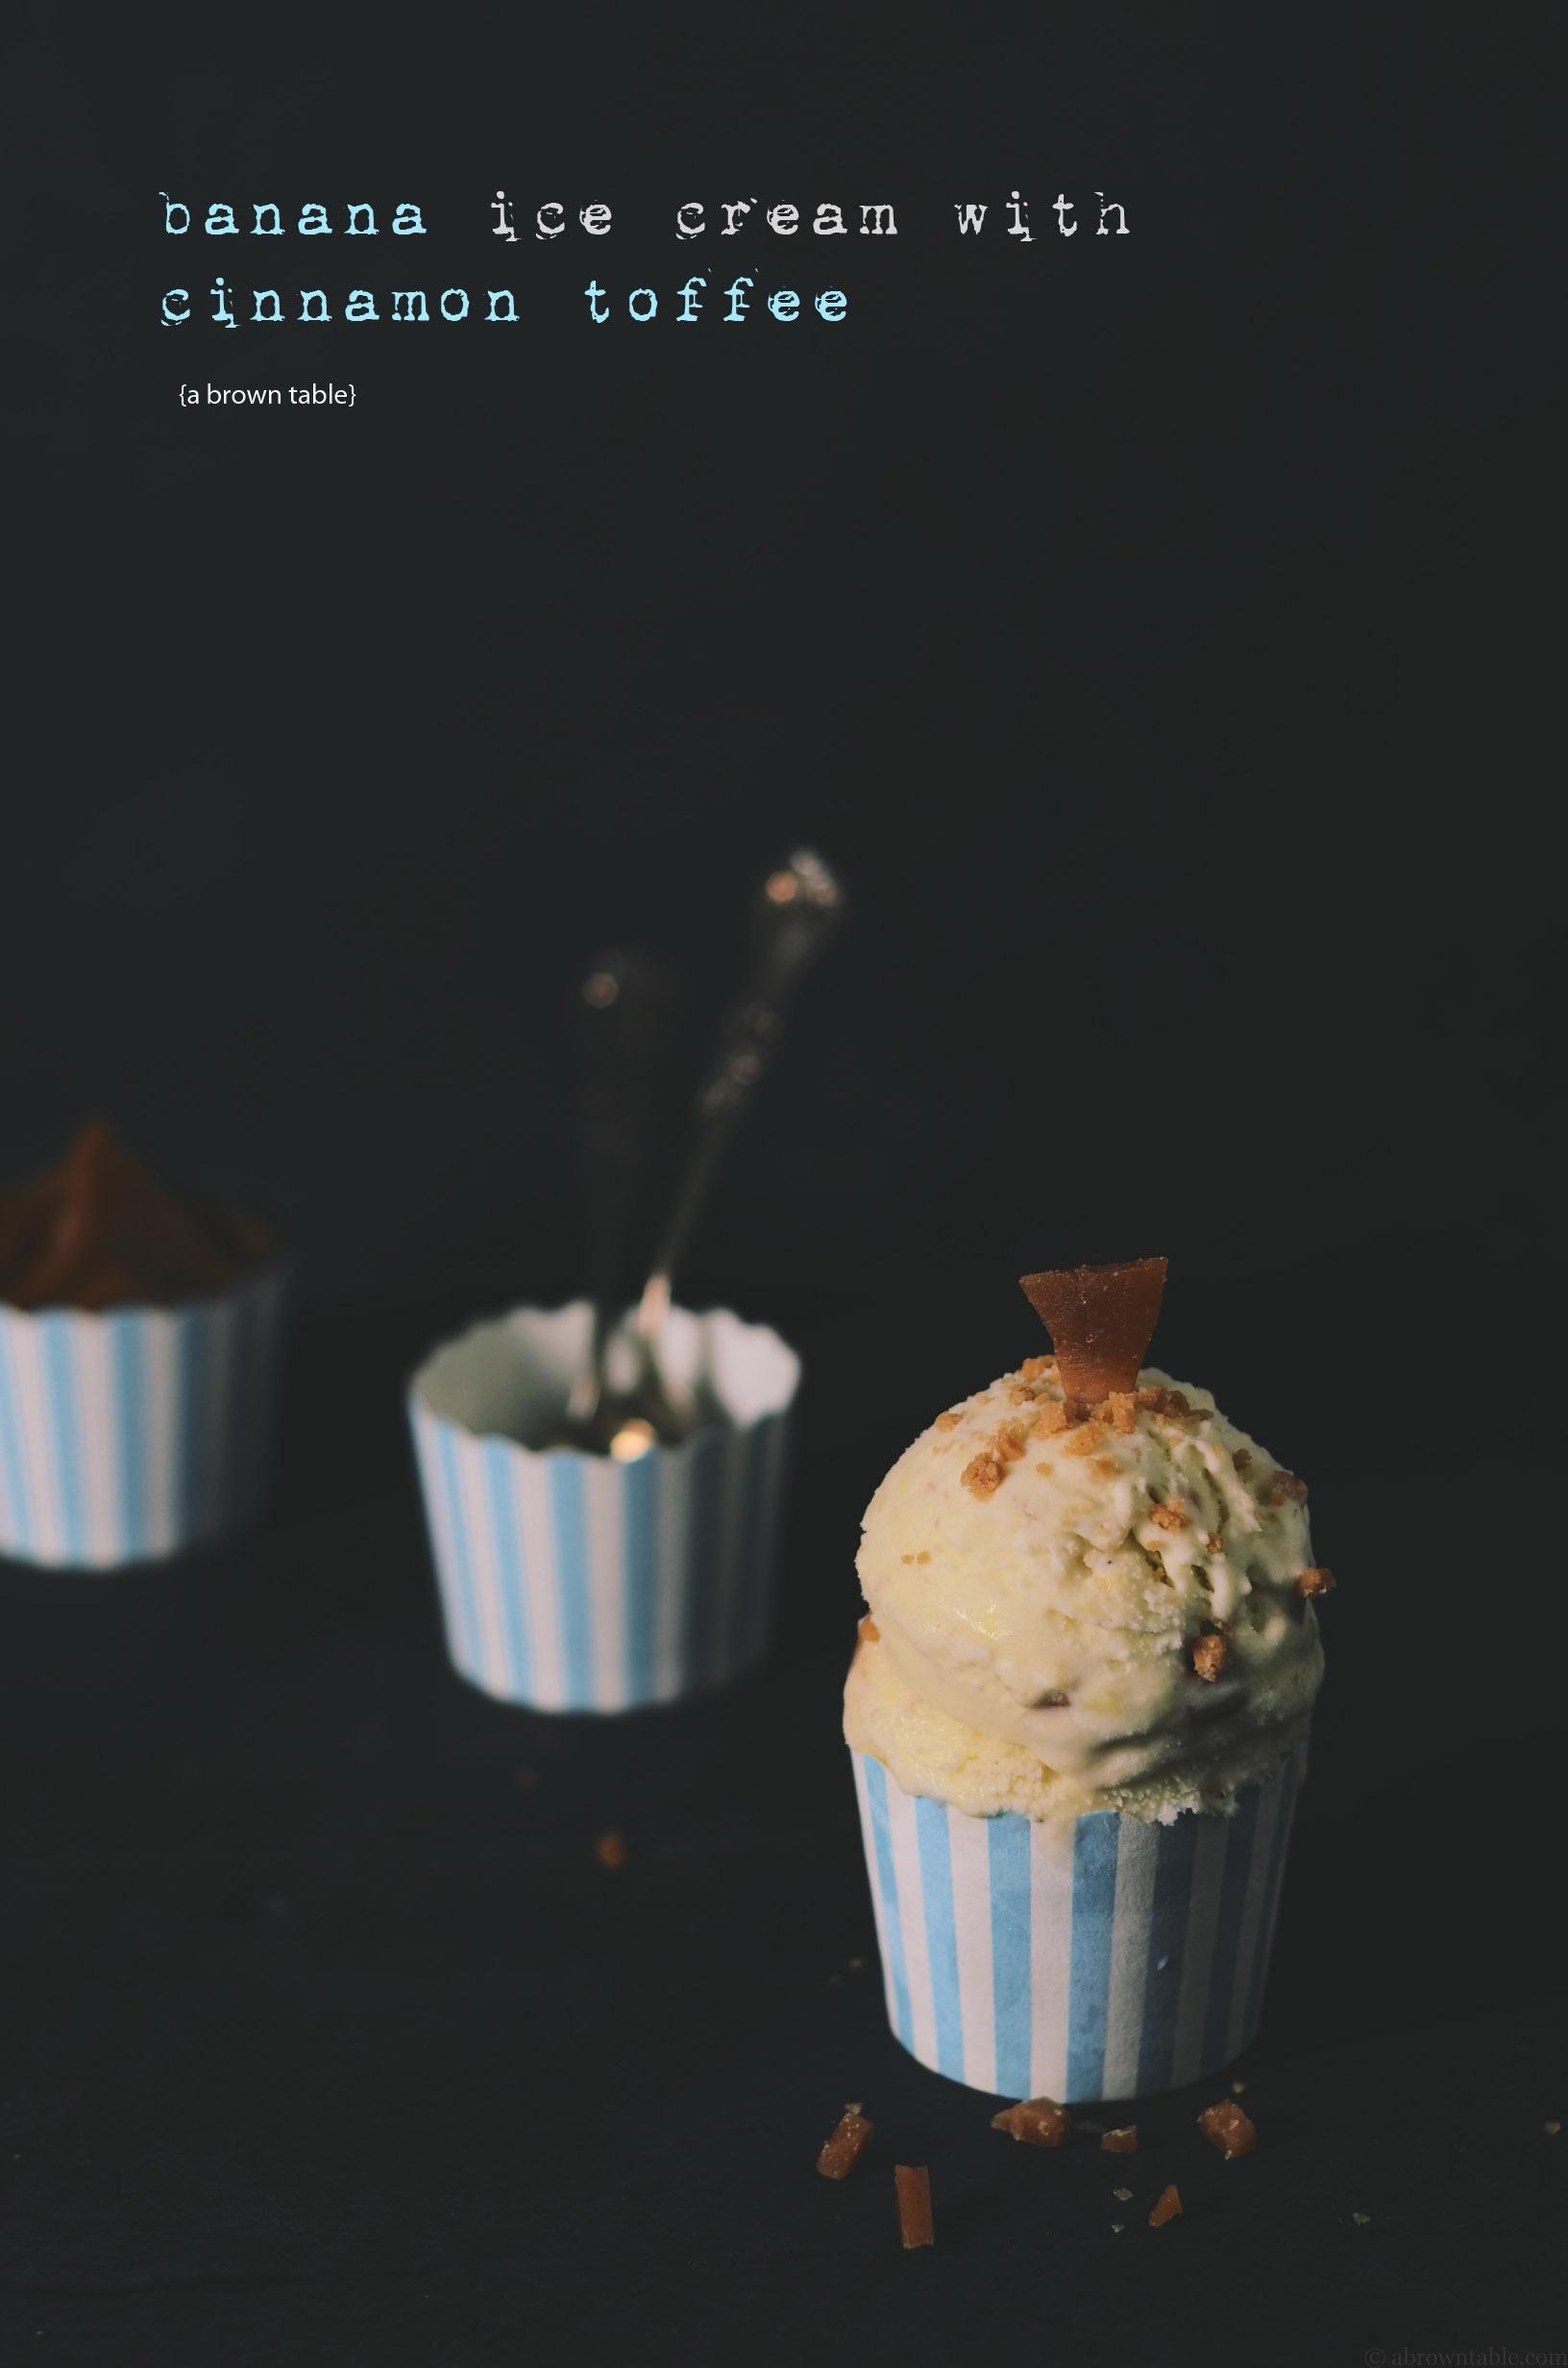 Banana ice cream with homemade cinnamon toffee chips